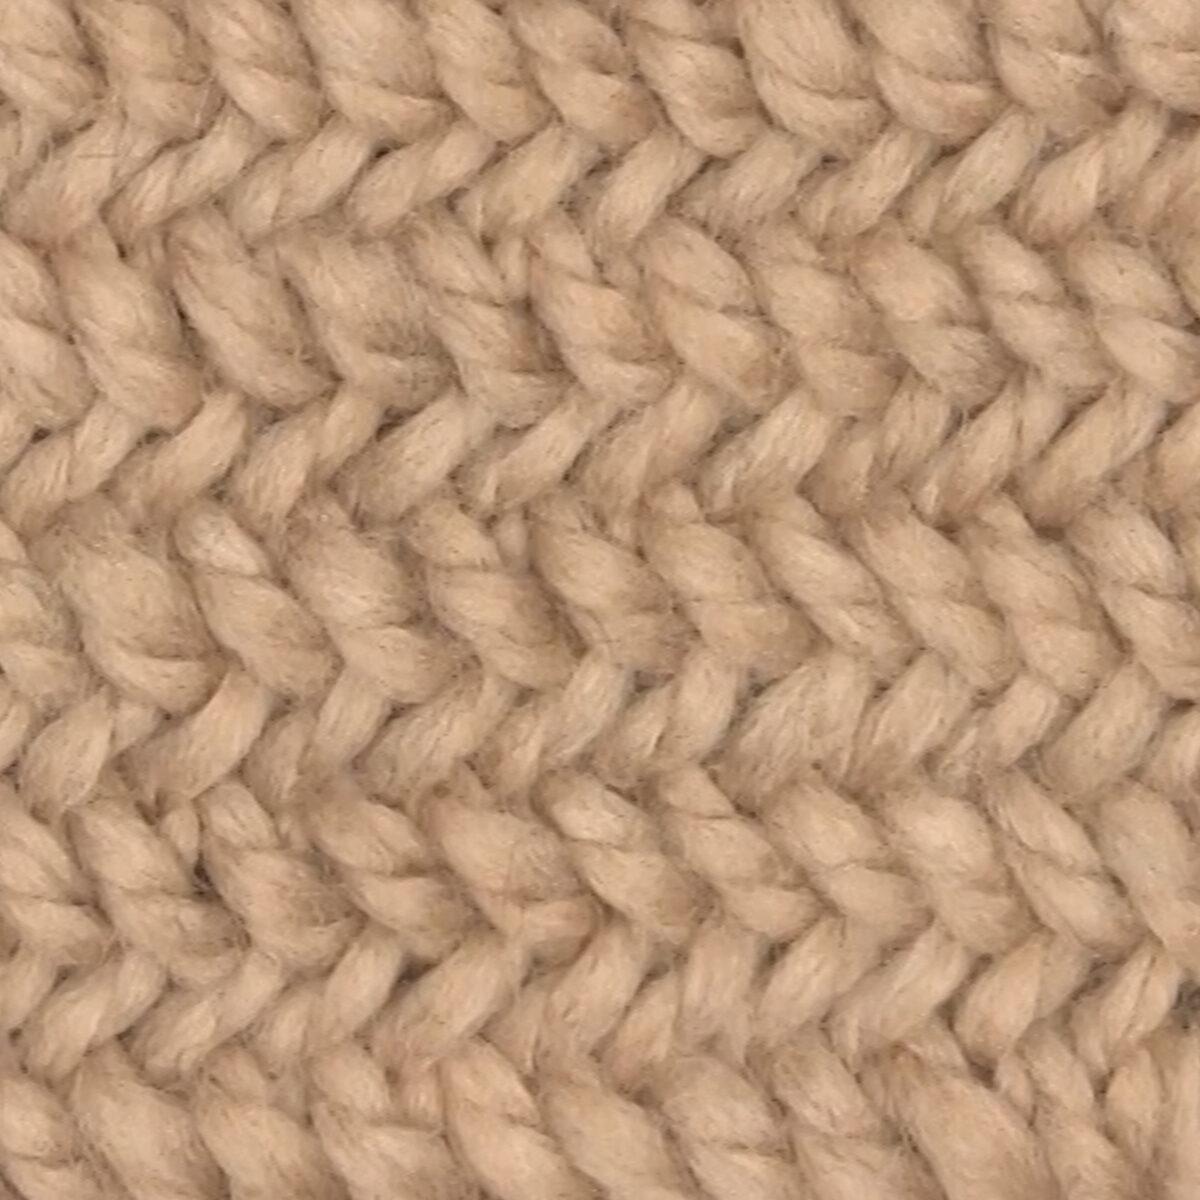 Knitted Herringbone Stitch Pattern texture in beige color yarn.